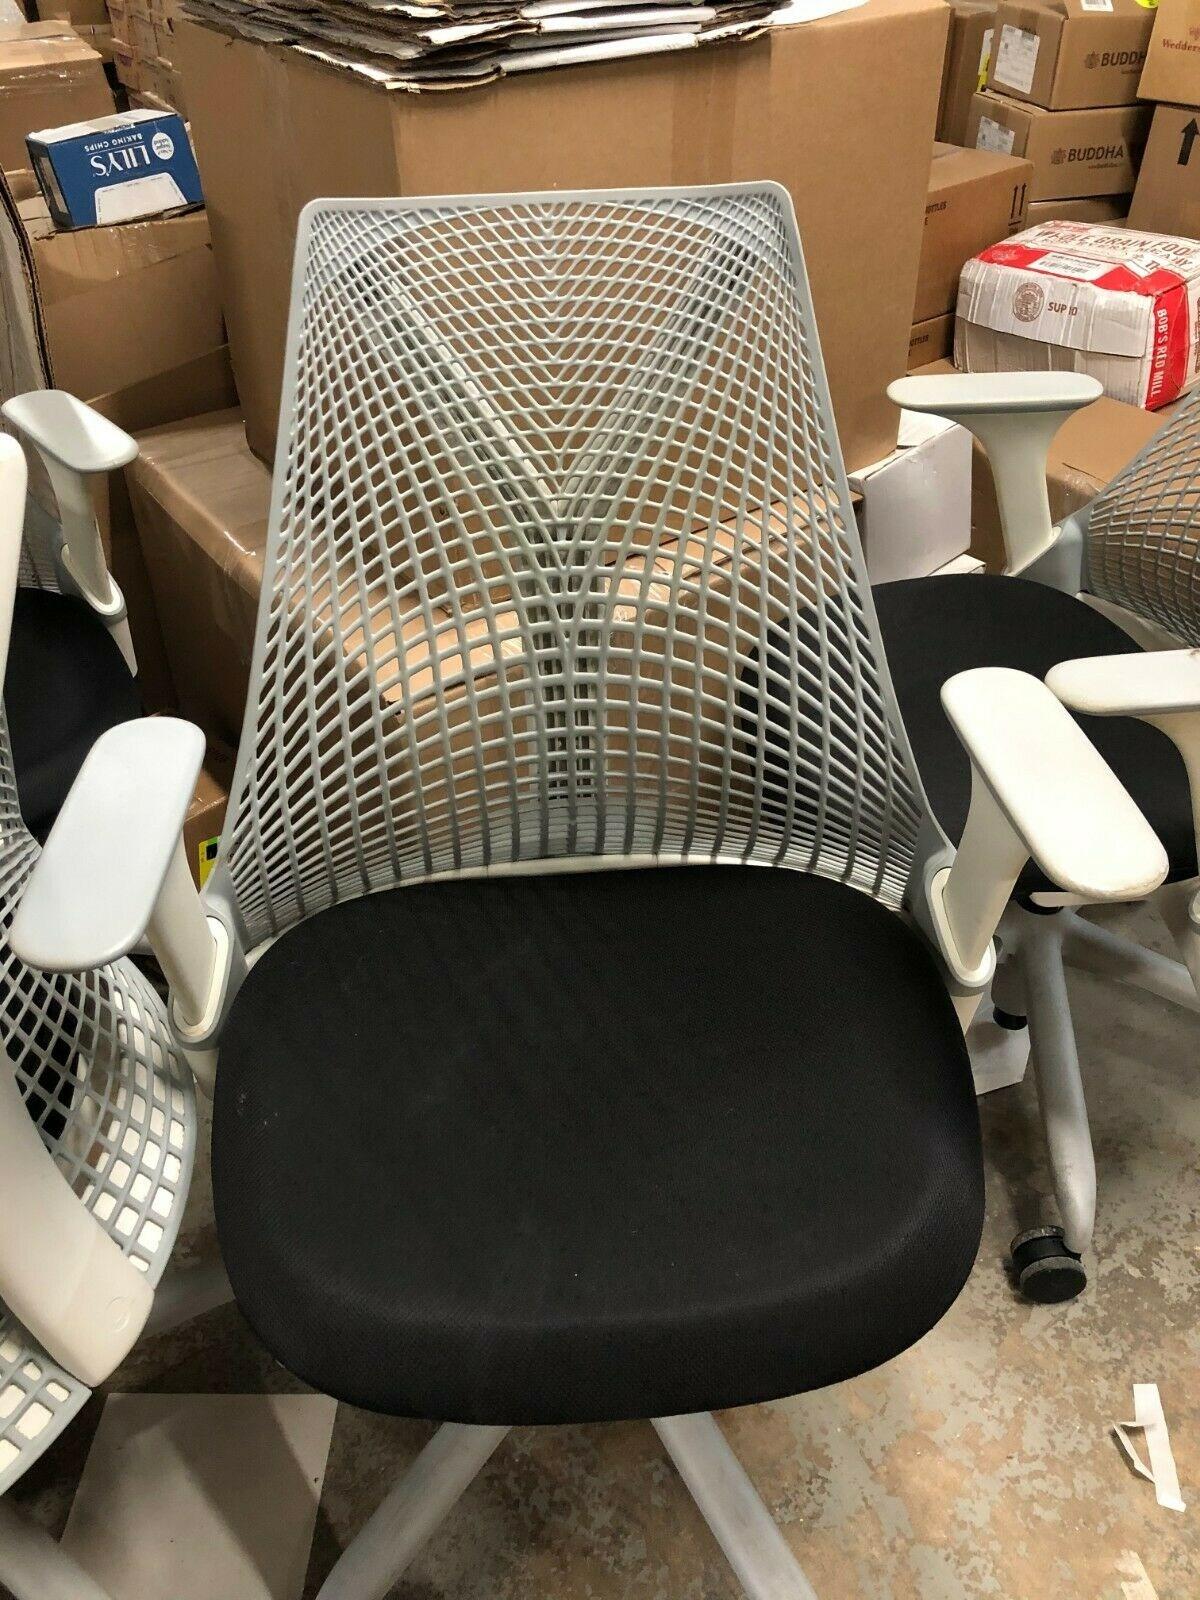 Herman Miller Sayl Office Chair - Authentic, Studio White